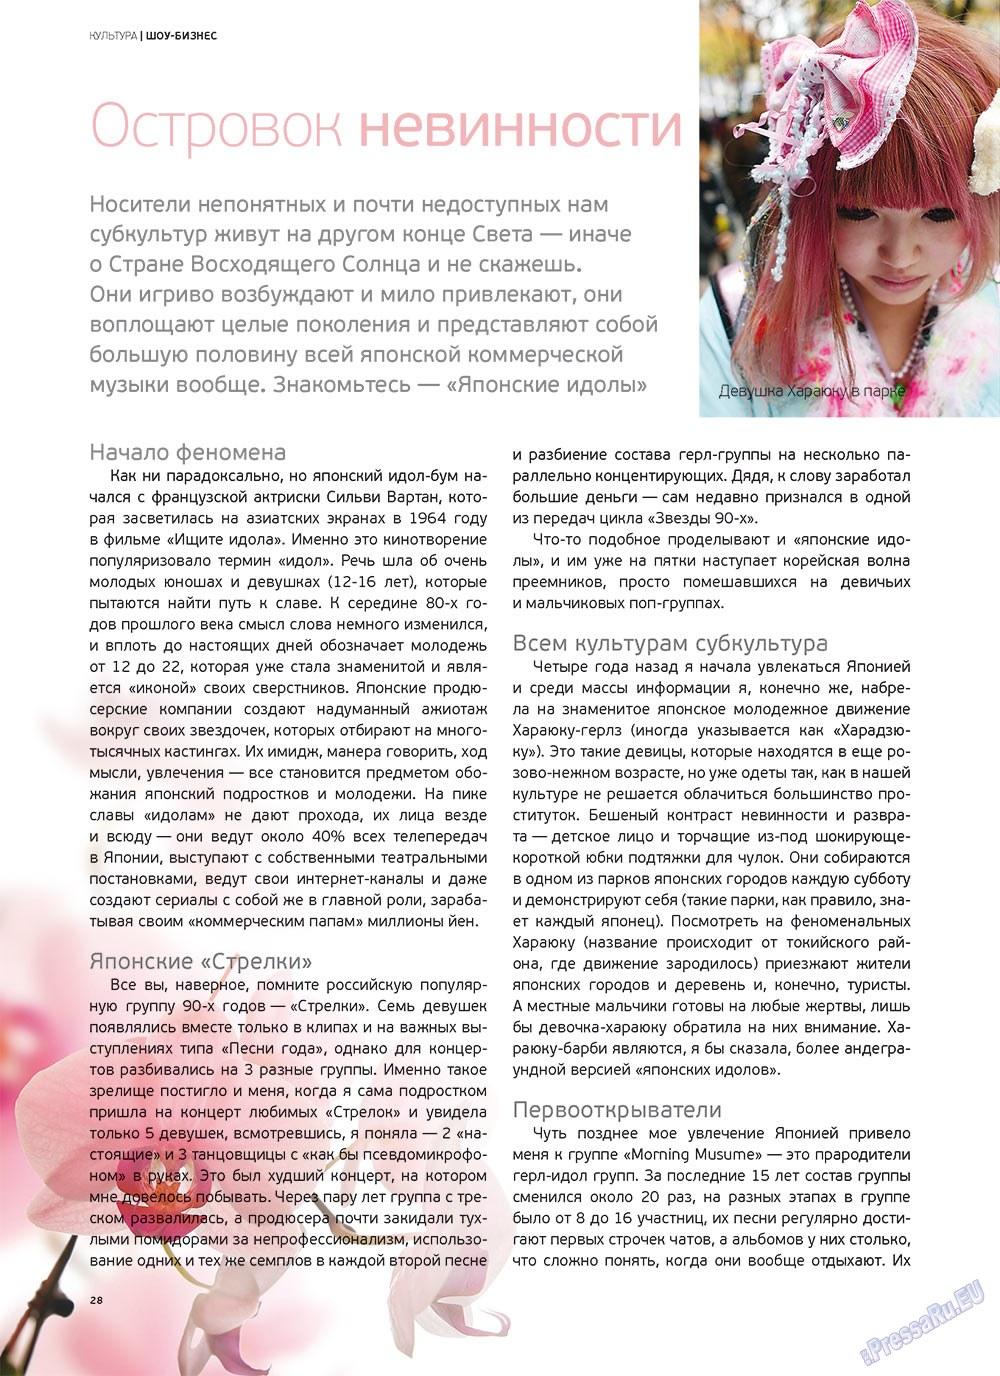 Артек (журнал). 2011 год, номер 6, стр. 30